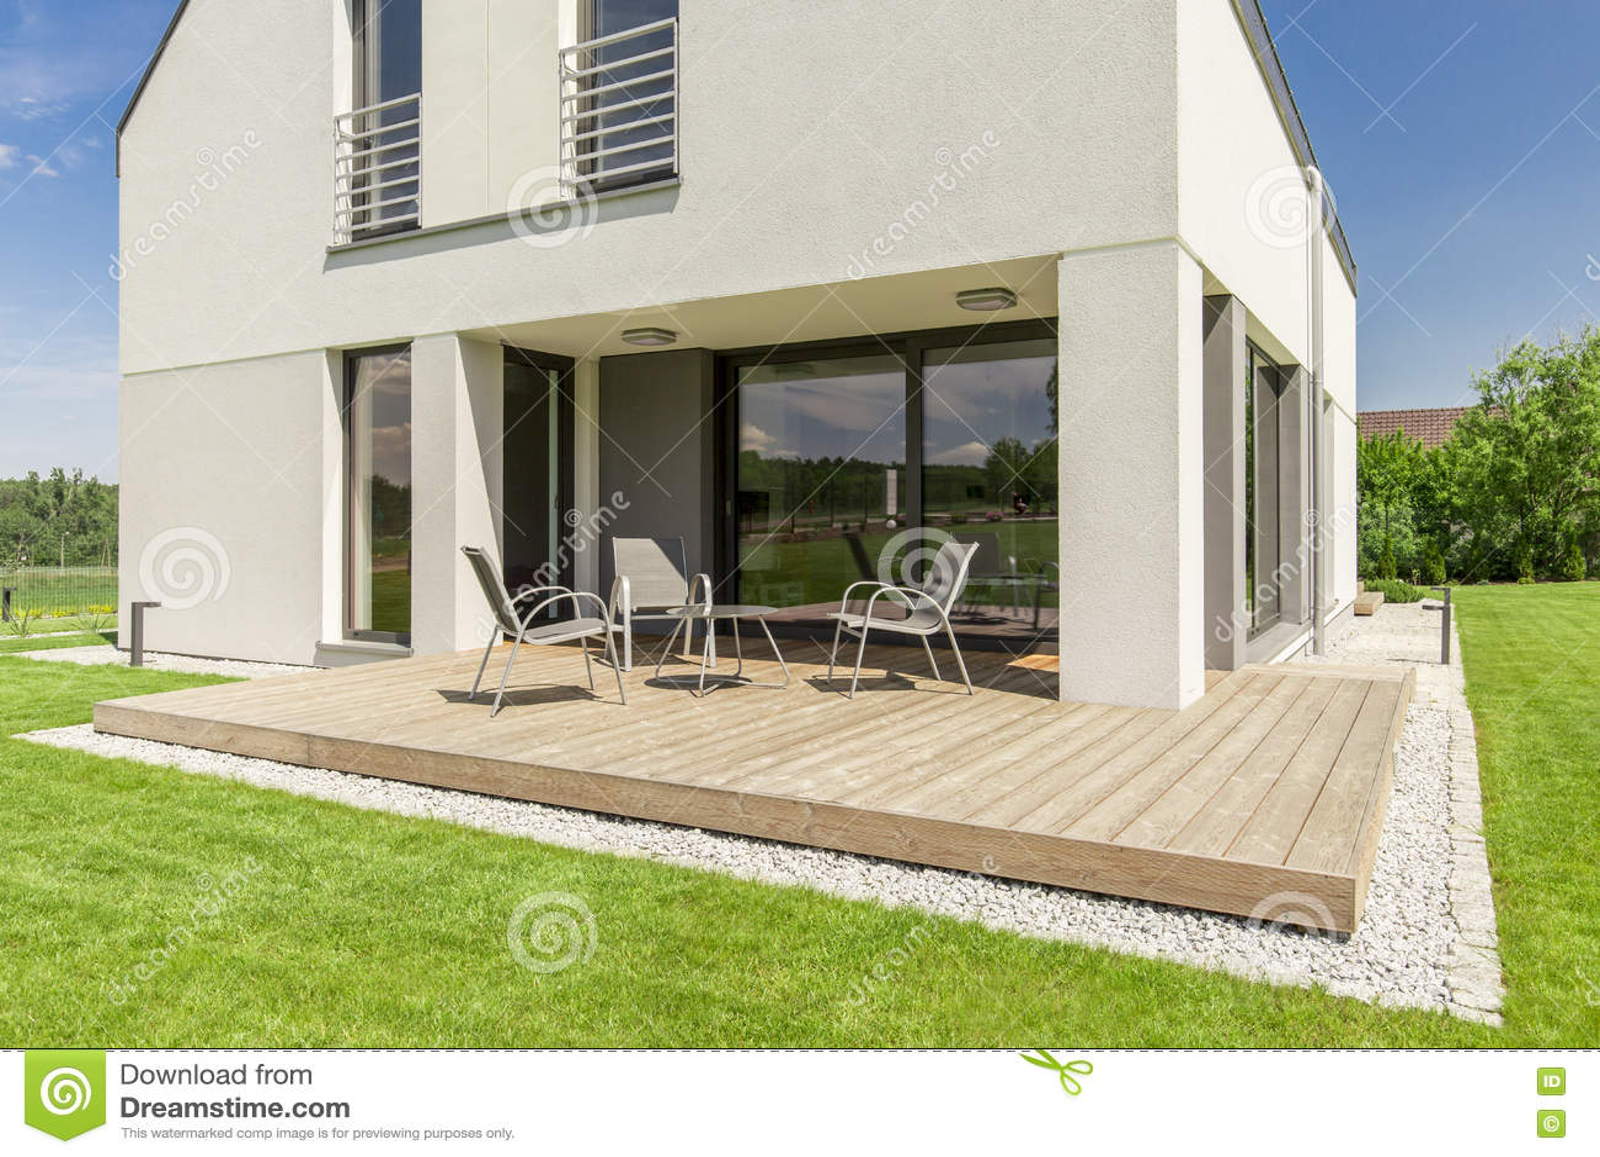 Minimalist Modern House Terrace Stock Photo Image Of Front Patio